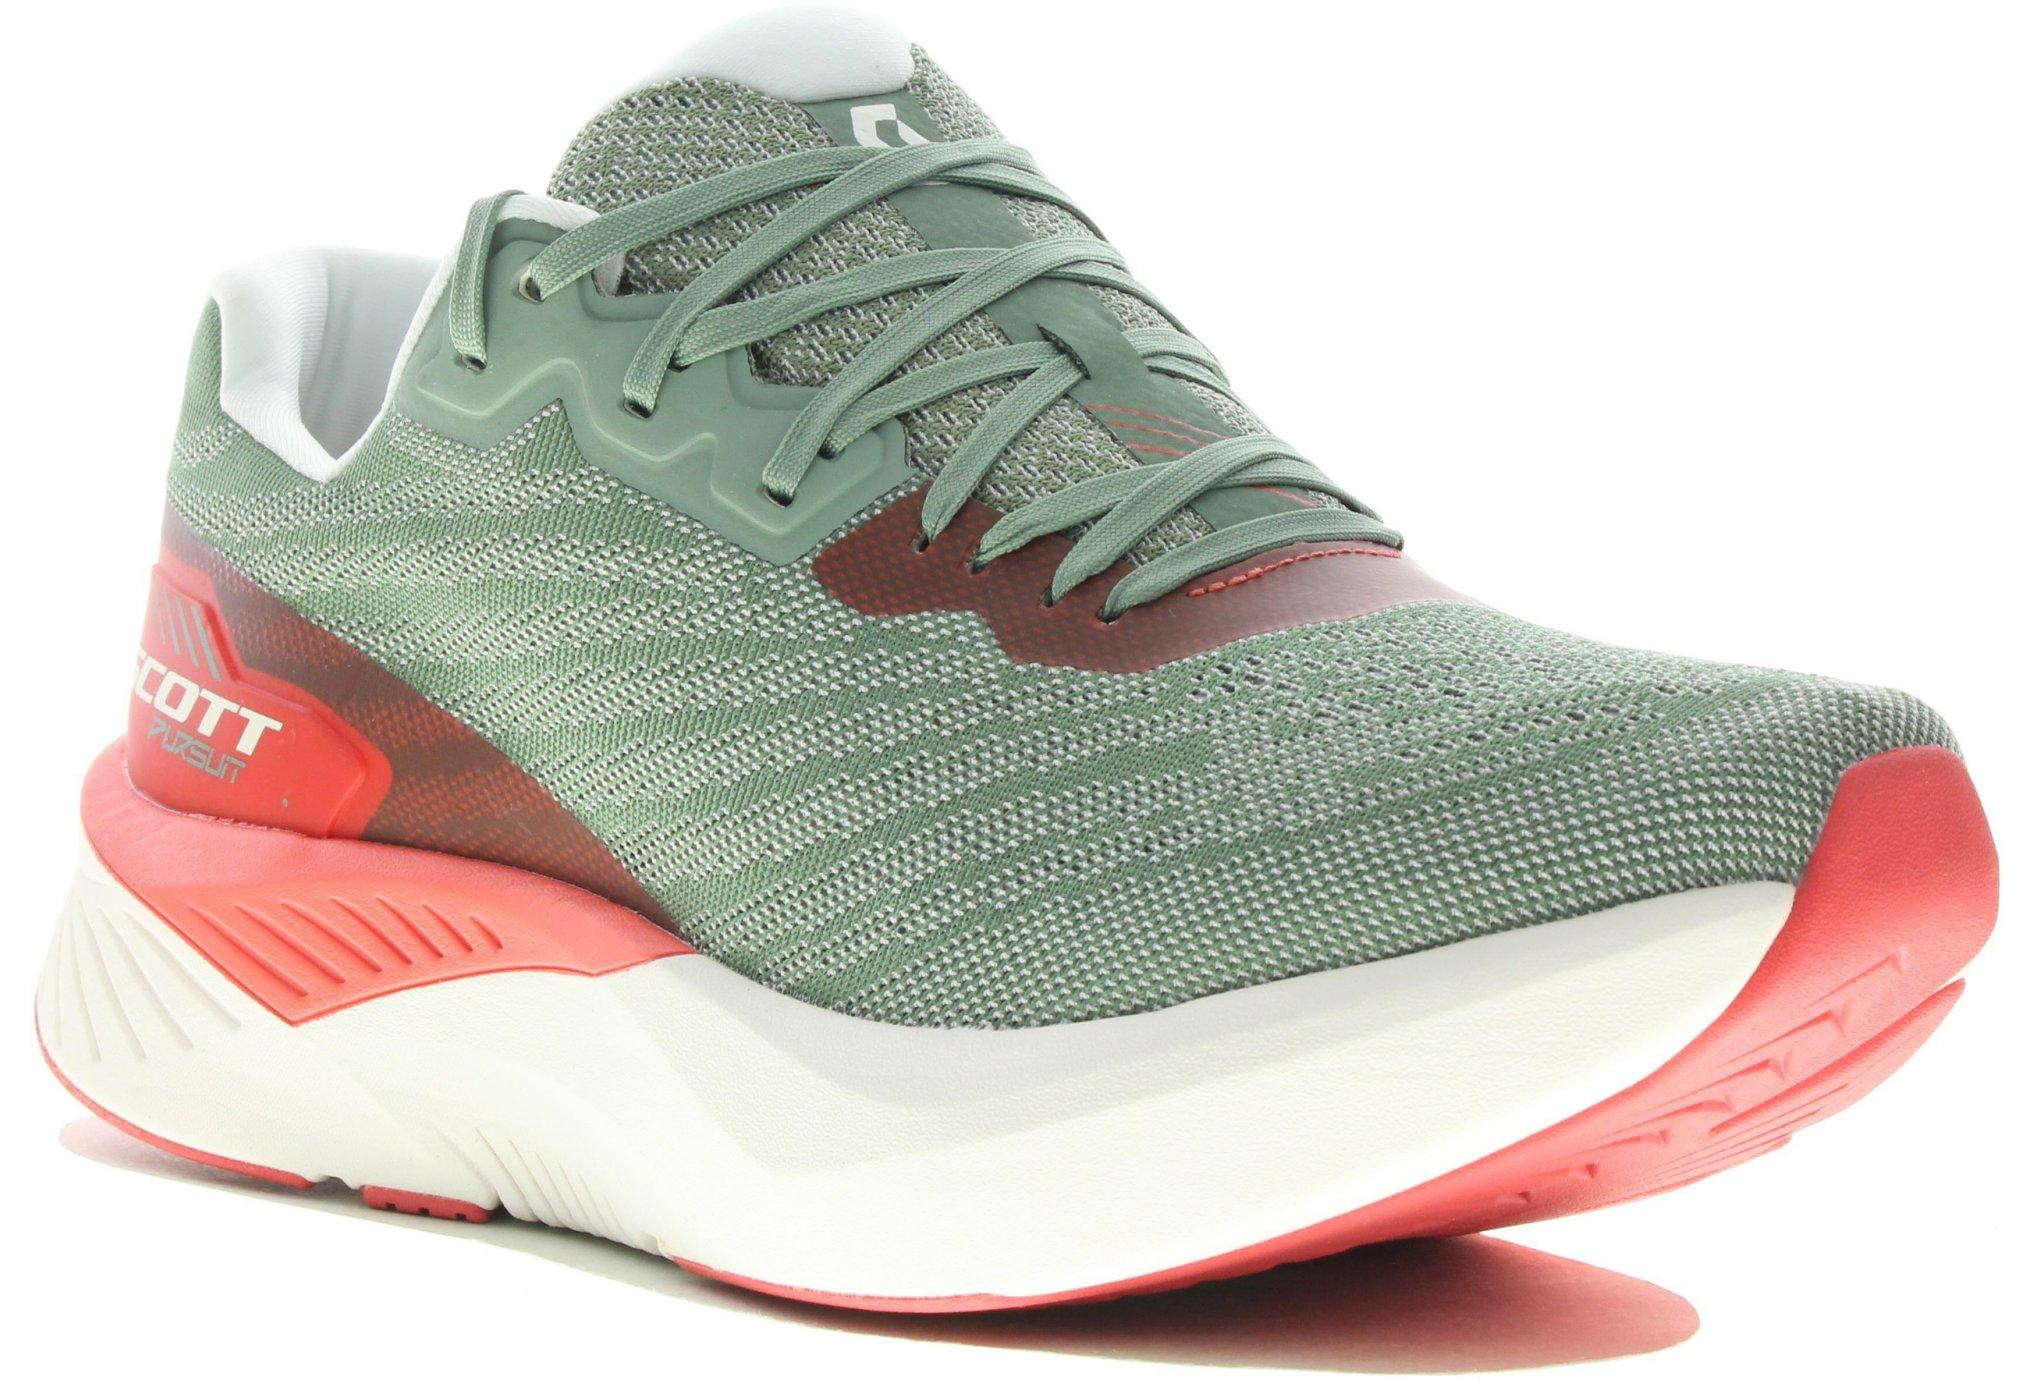 Scott Pursuit W Chaussures running femme